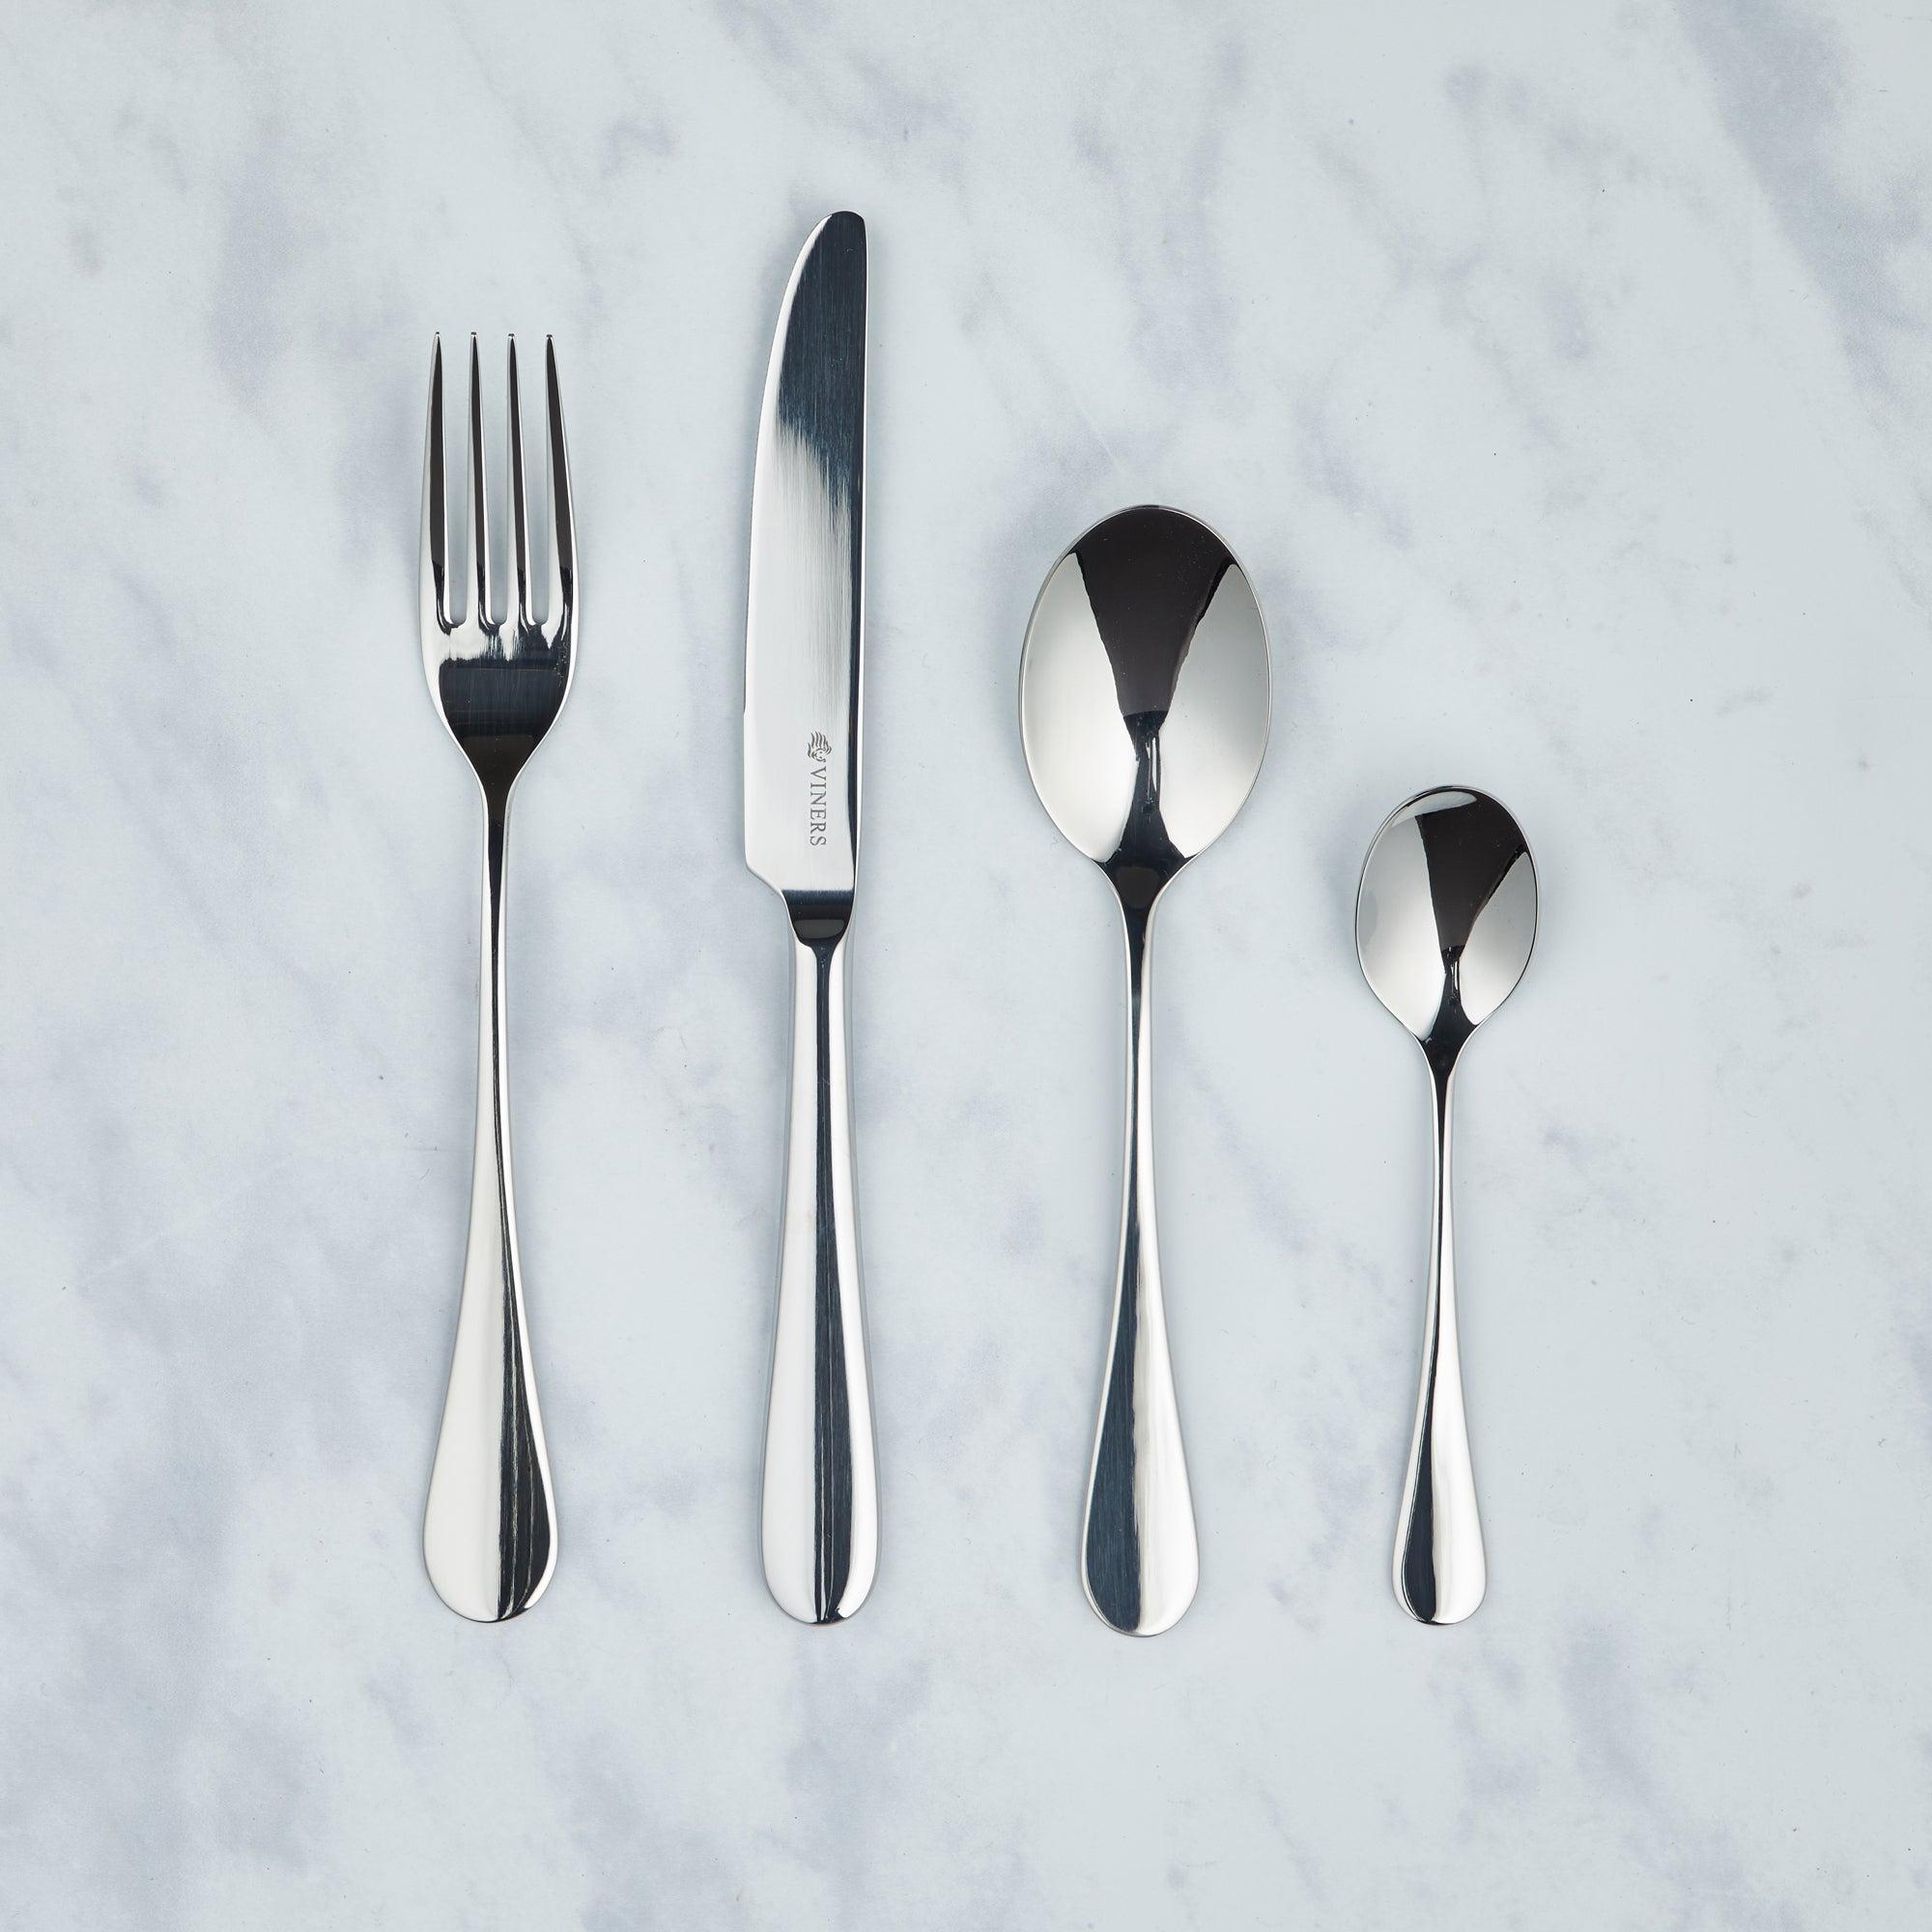 viners select 16 piece cutlery set dunelm. Black Bedroom Furniture Sets. Home Design Ideas